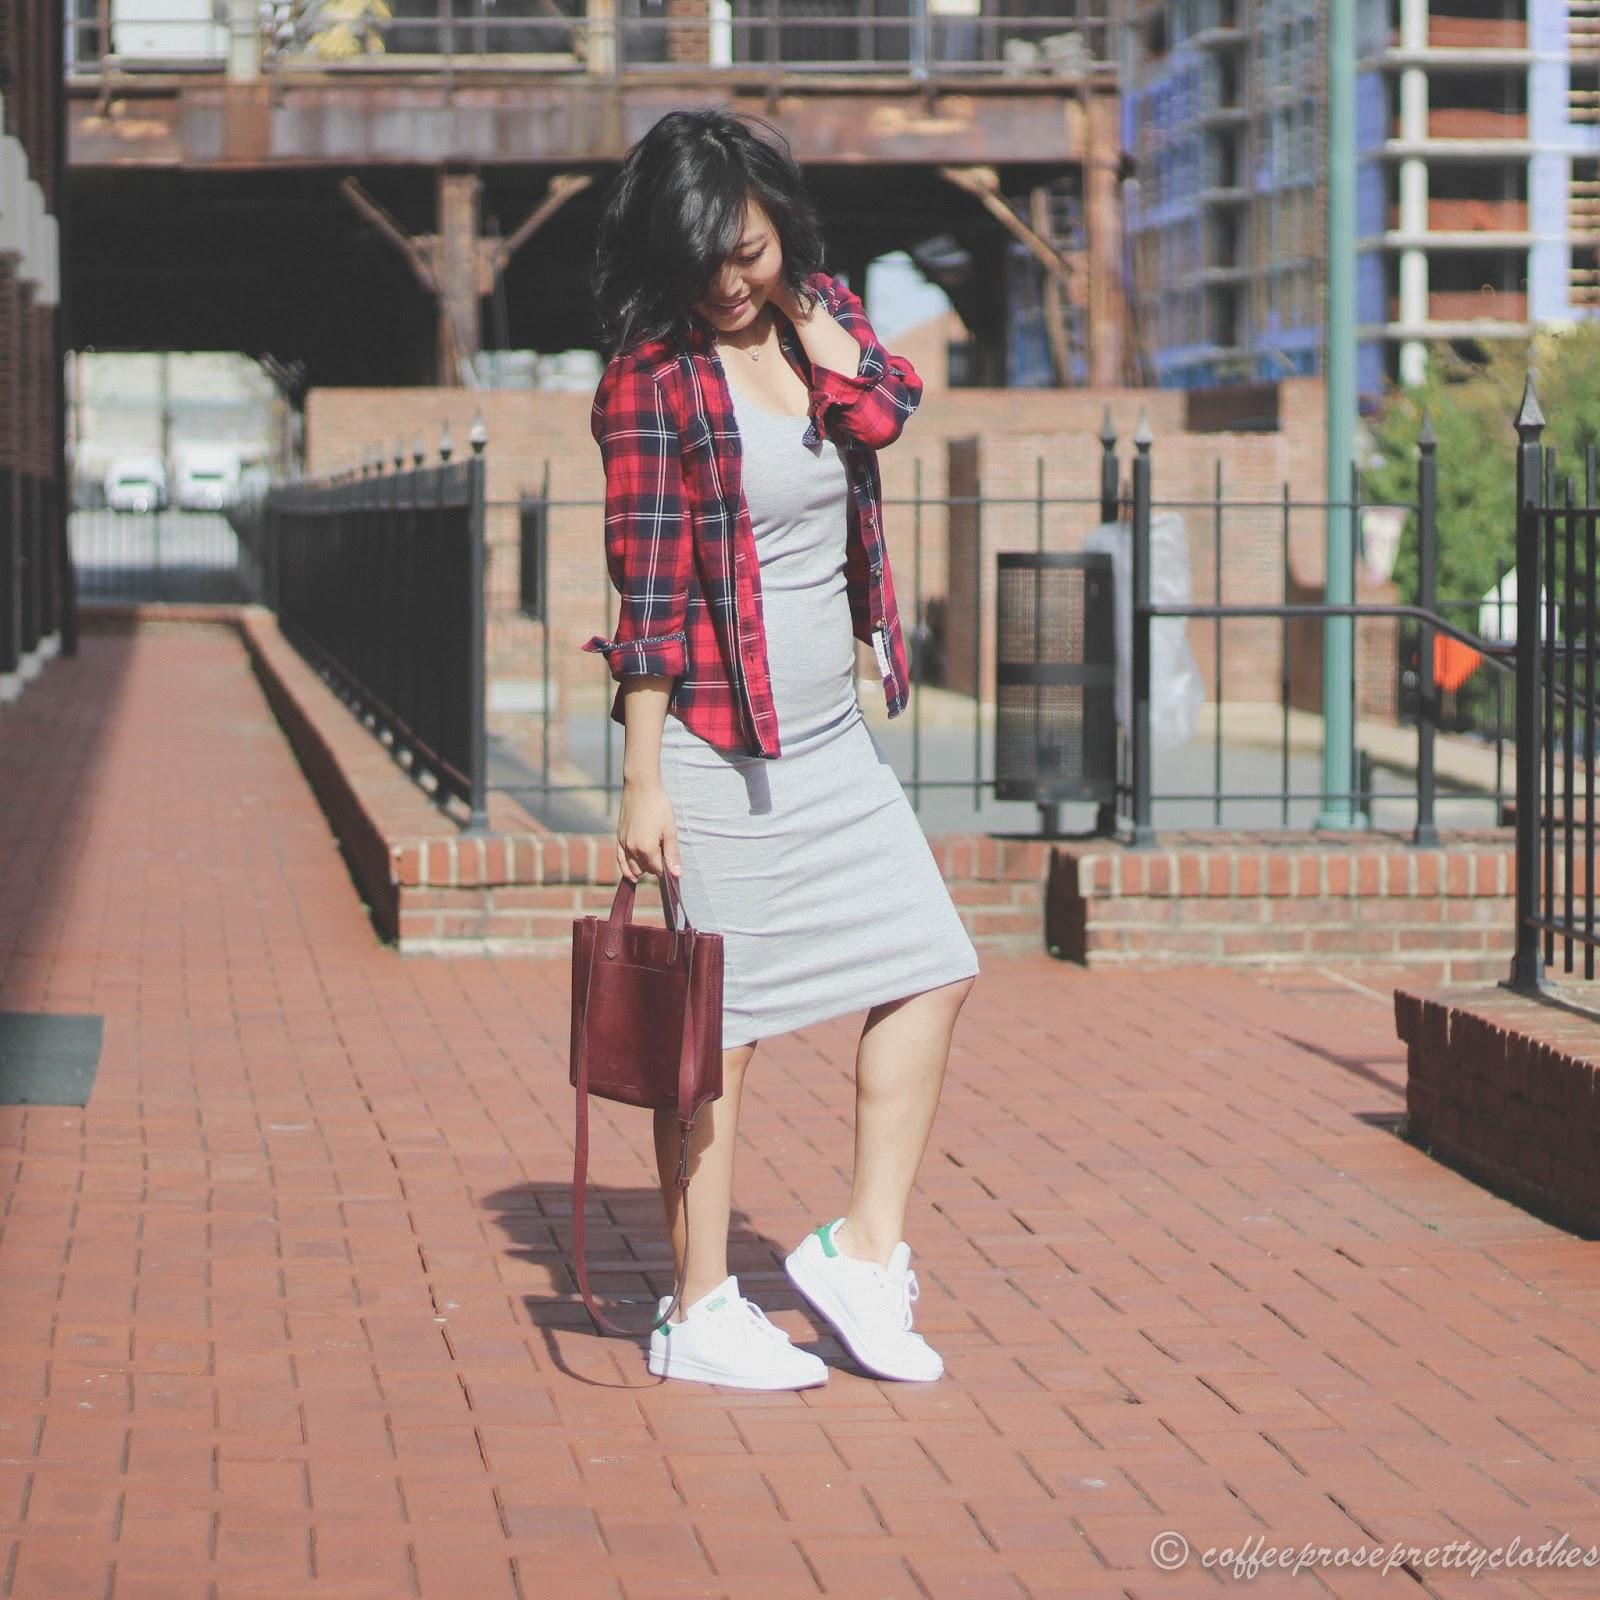 Adidas Stan Smith, Madewell Transport, tank dress, plaid flannel